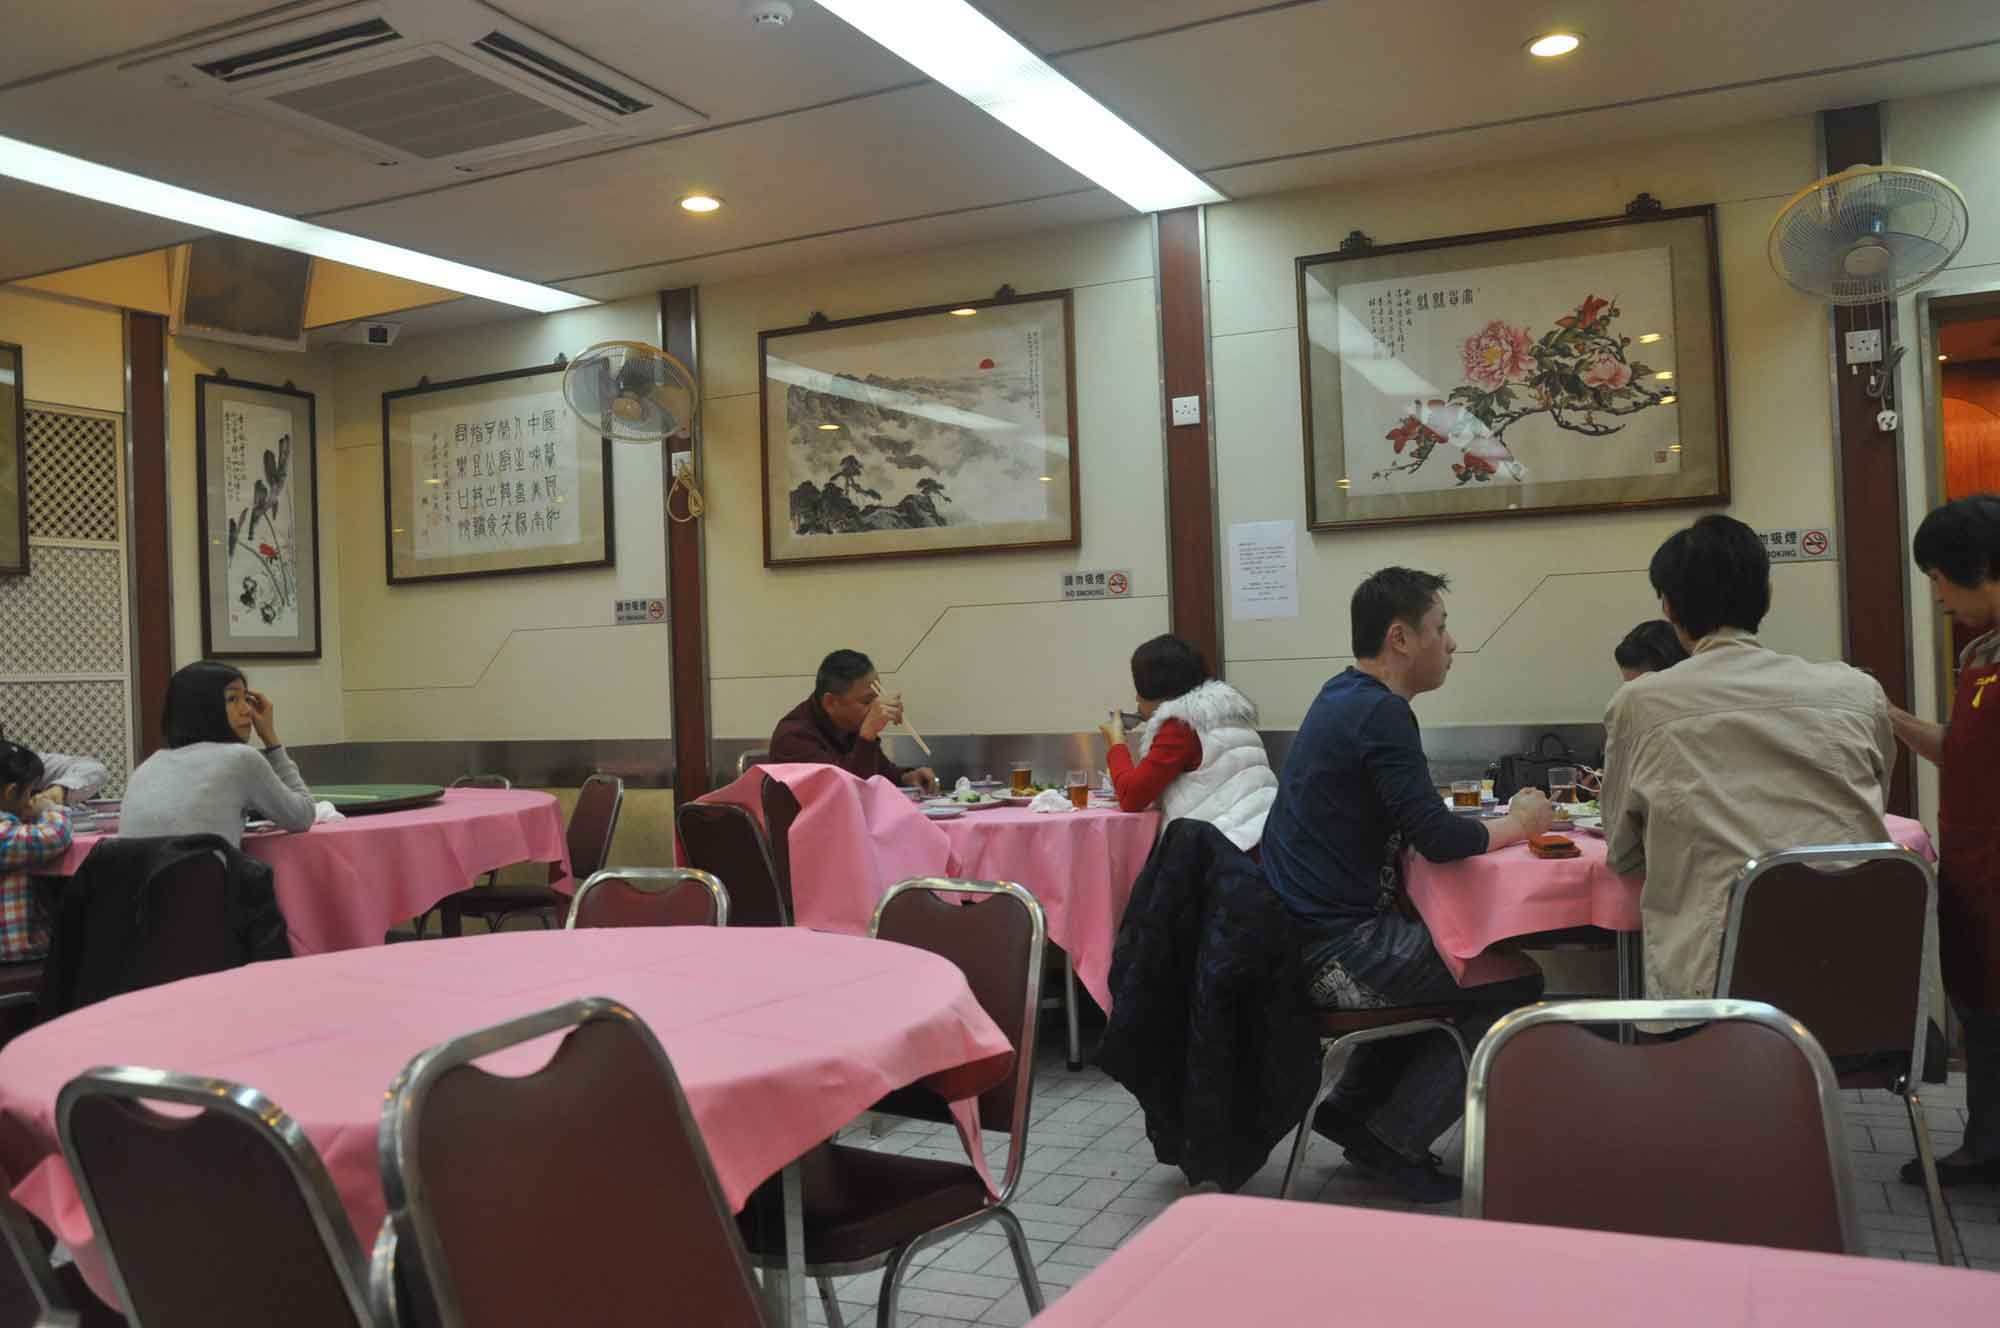 Southwest Restaurant Macau interior